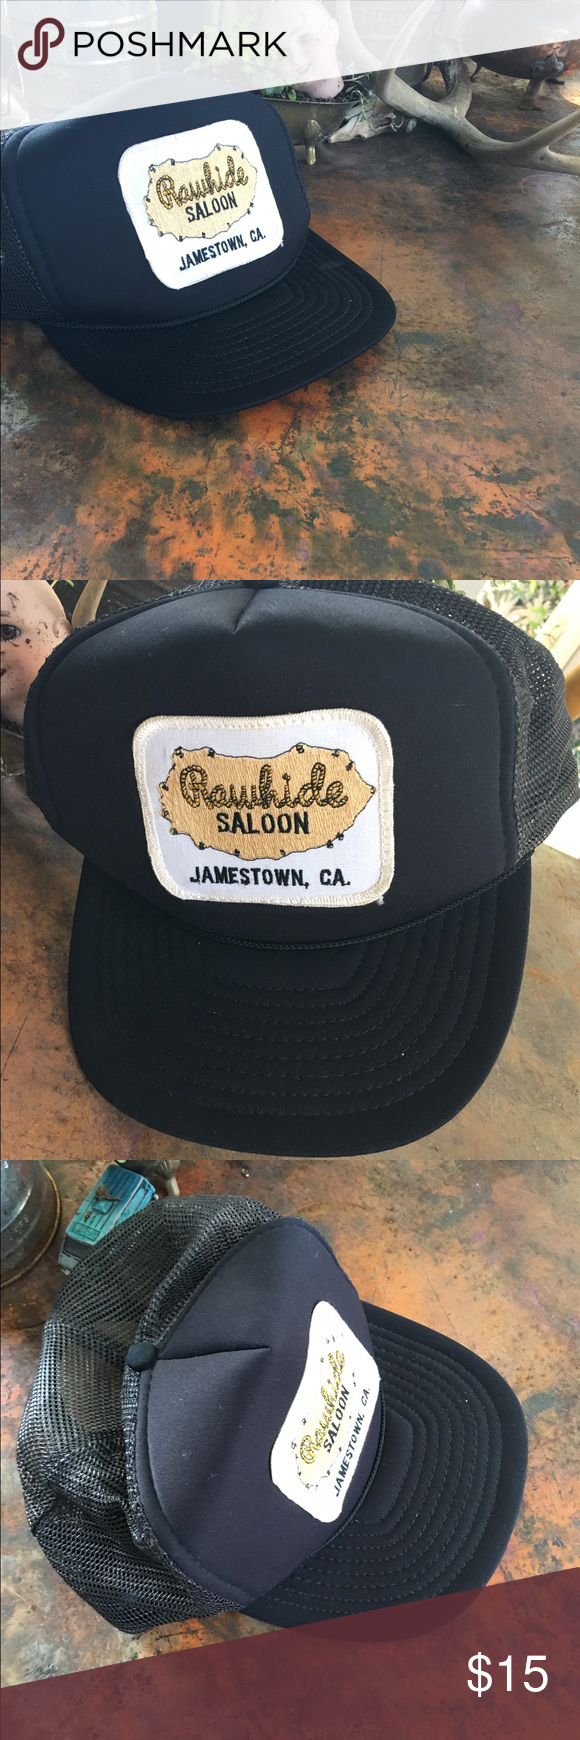 Vintage rawhide saloon snap back trucker hat Vintage black 37a3dff40a19